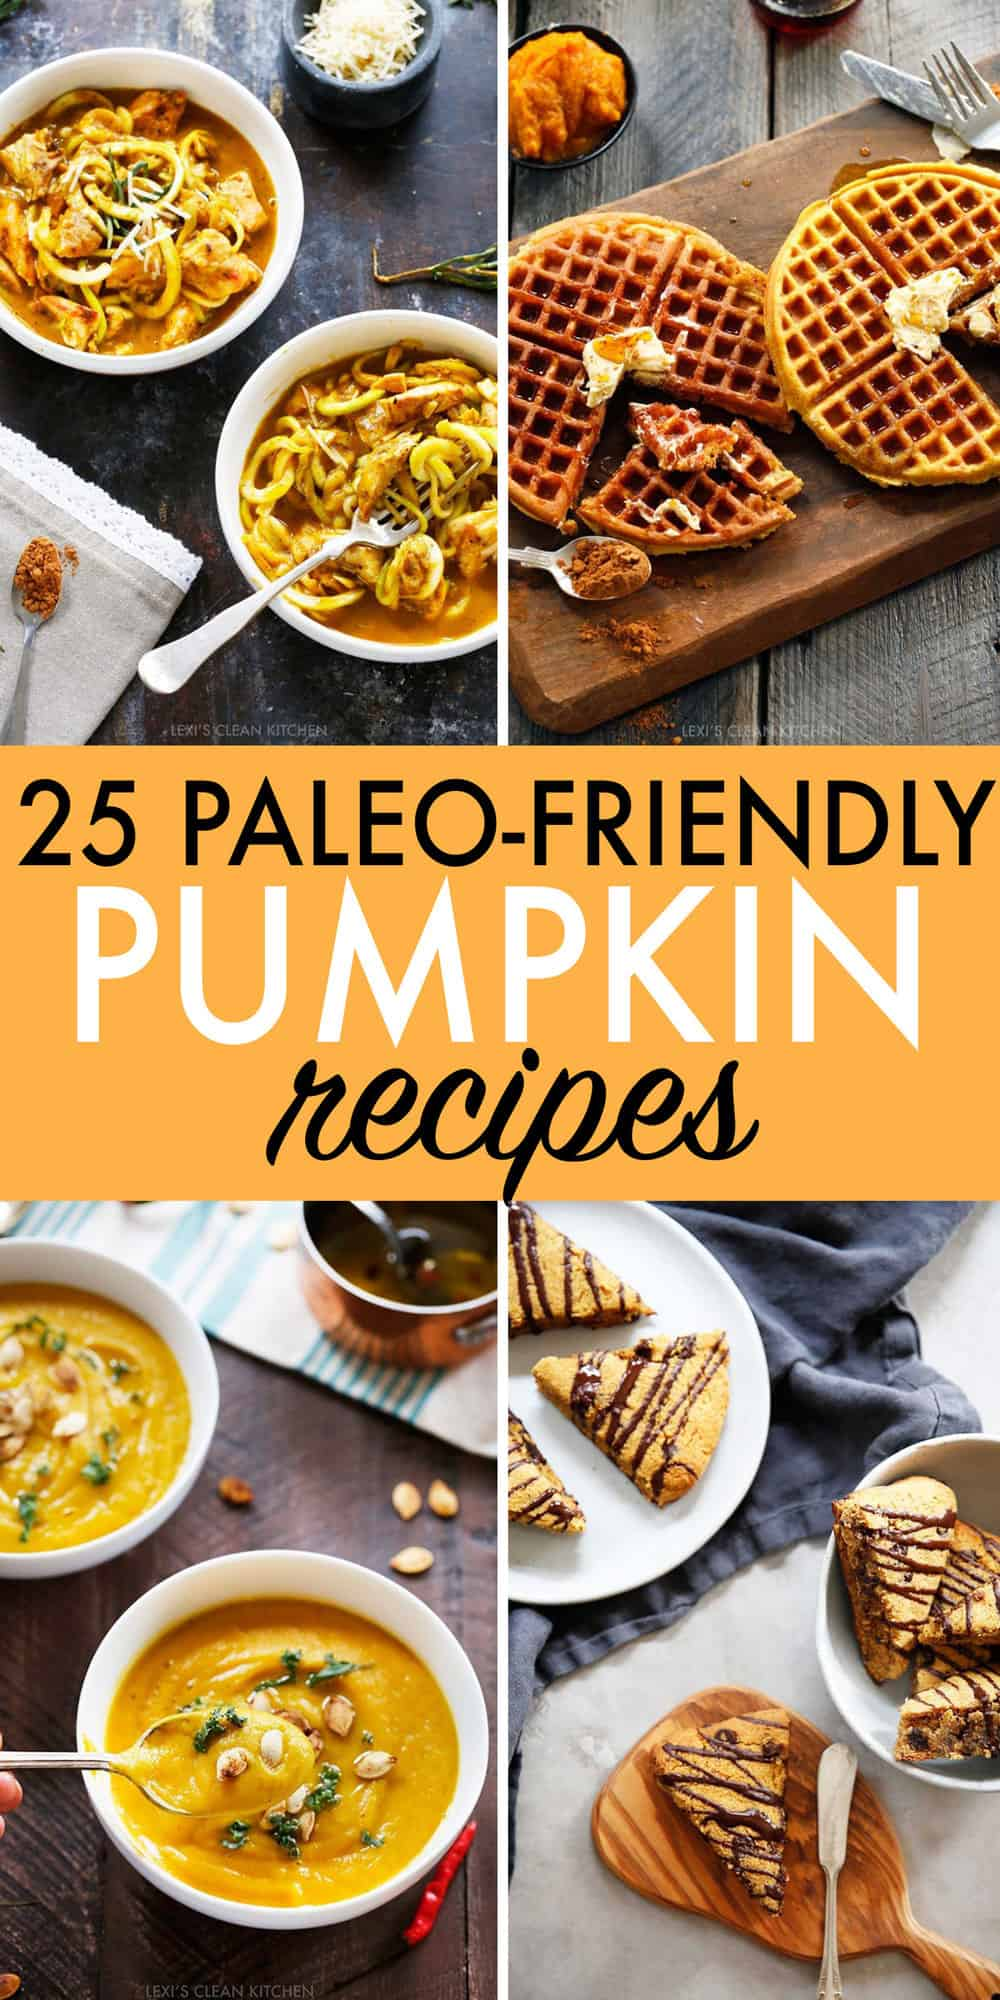 25 Paleo-Friendly Pumpkin Recipes to Make This Year - Lexi's Clean Kitchen